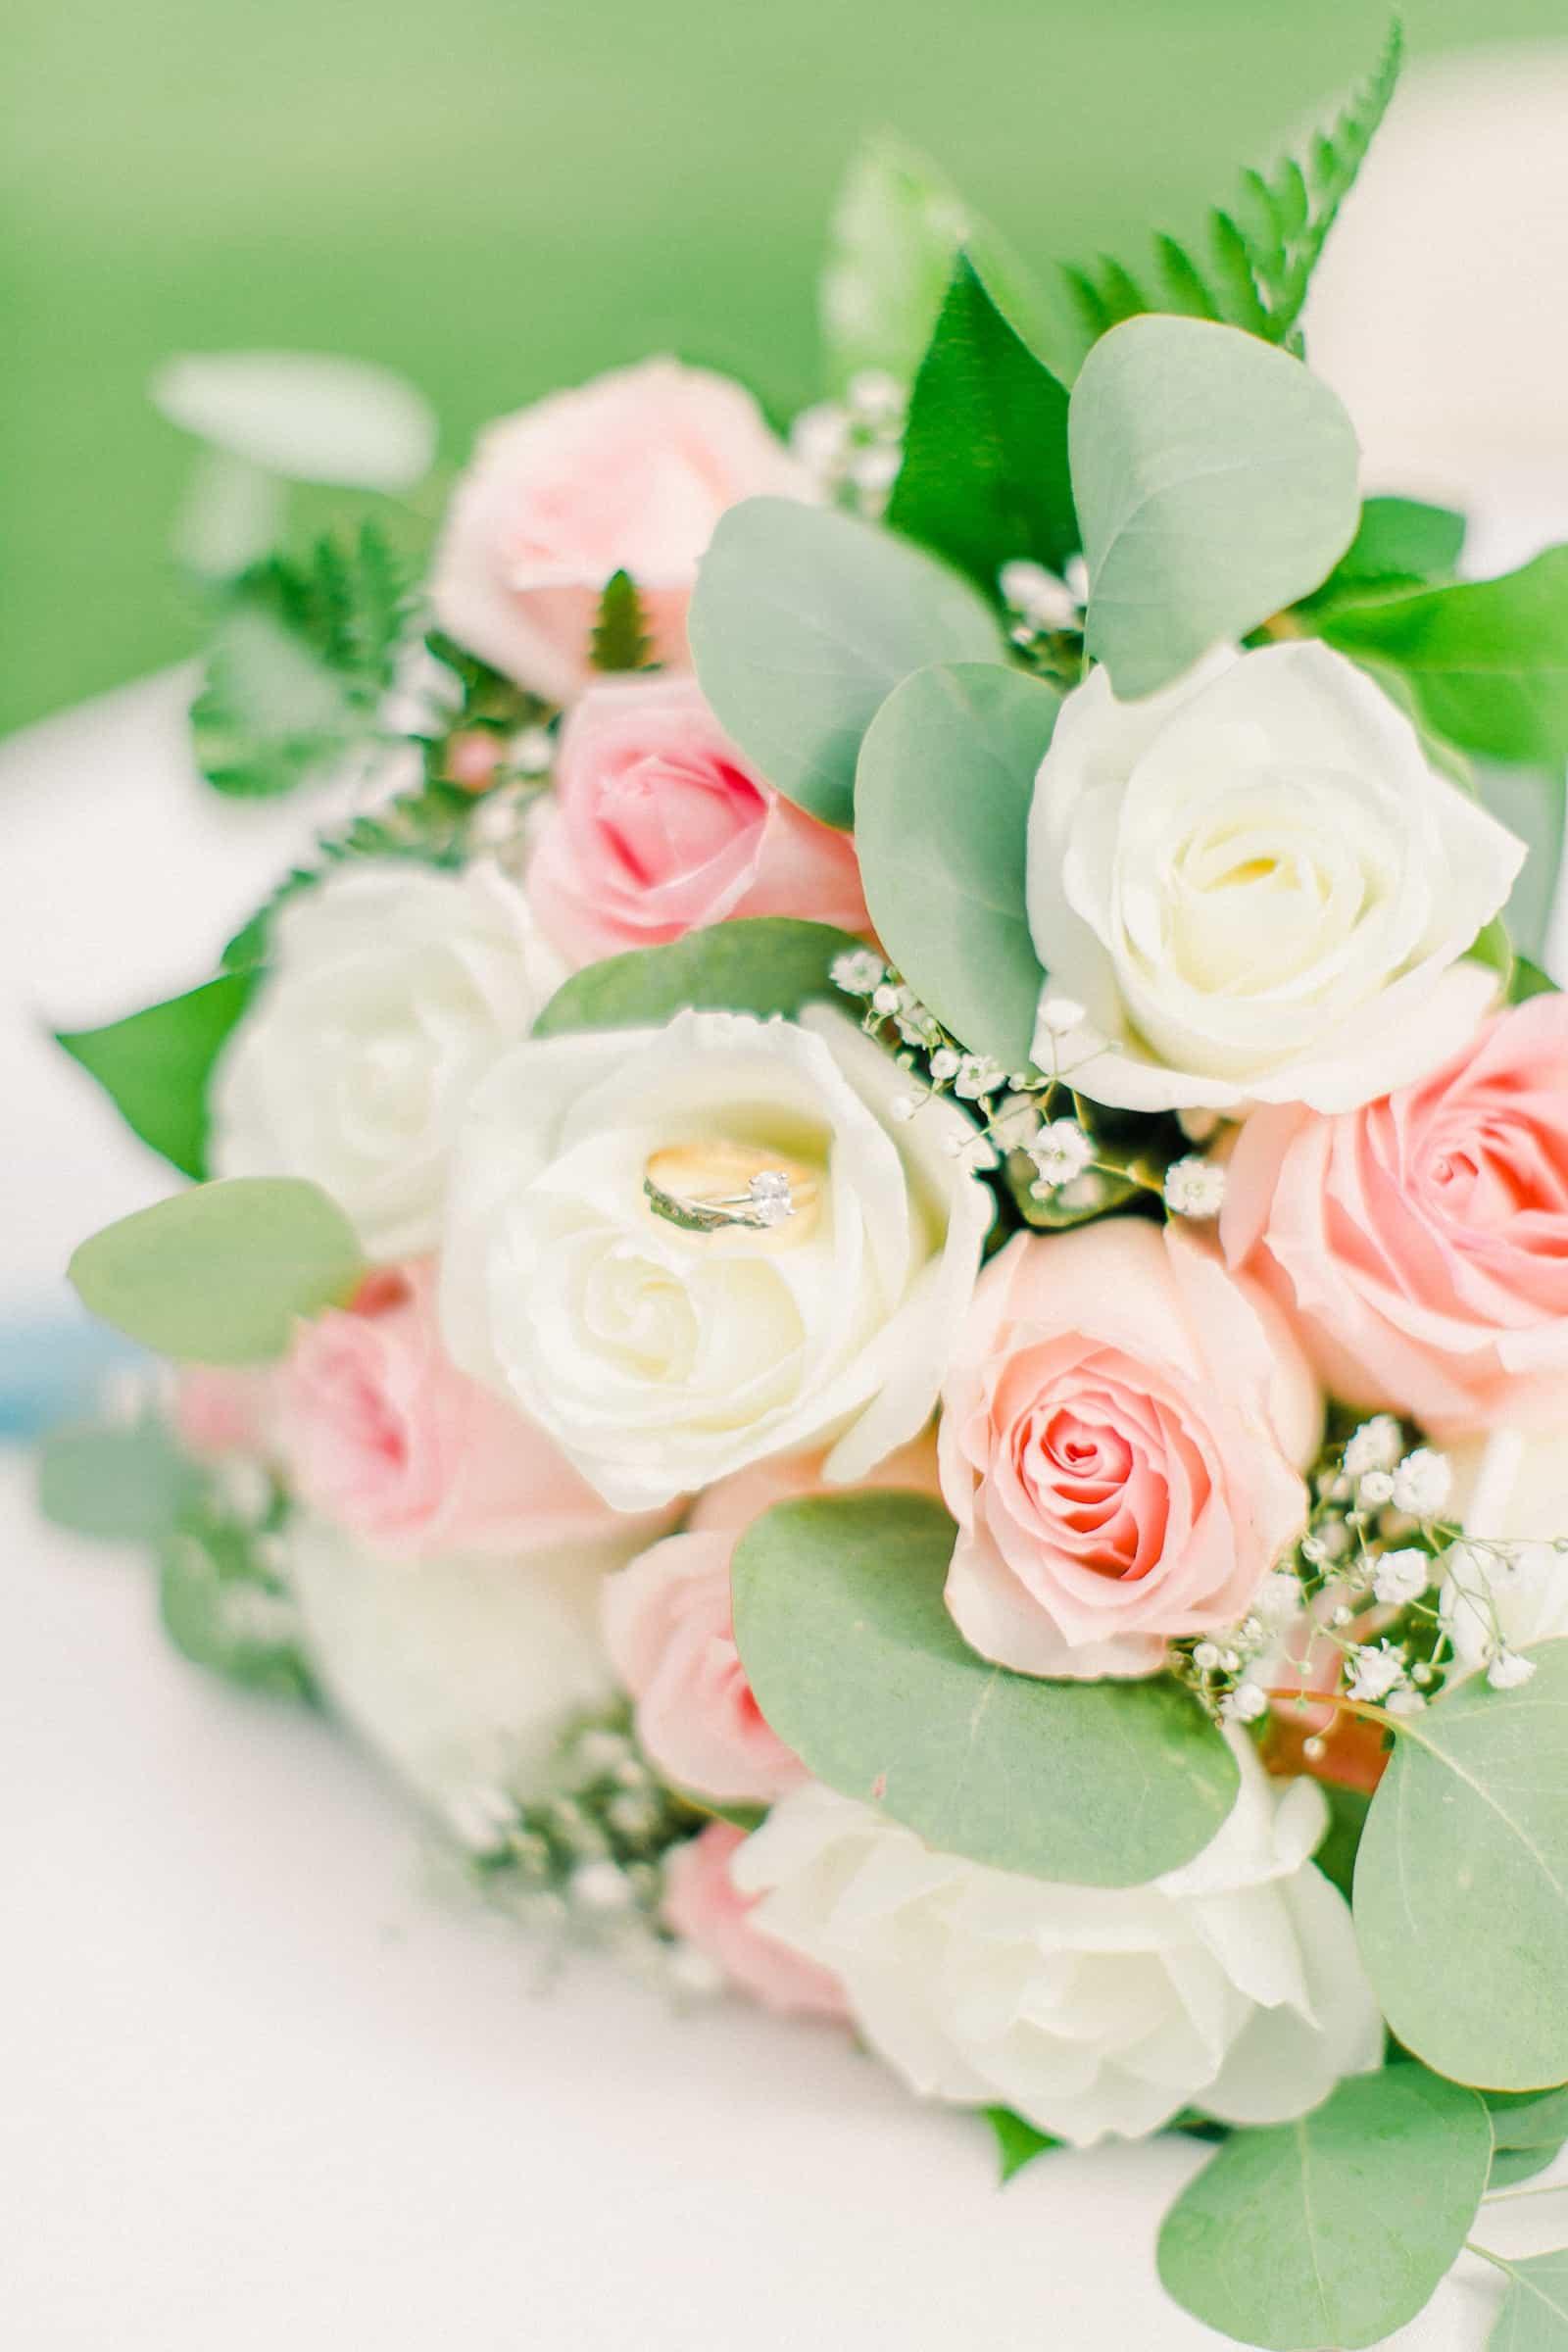 Draper LDS Temple Wedding, Utah wedding photography, summer backyard wedding, bridal bouquet pink and white roses, wedding rings